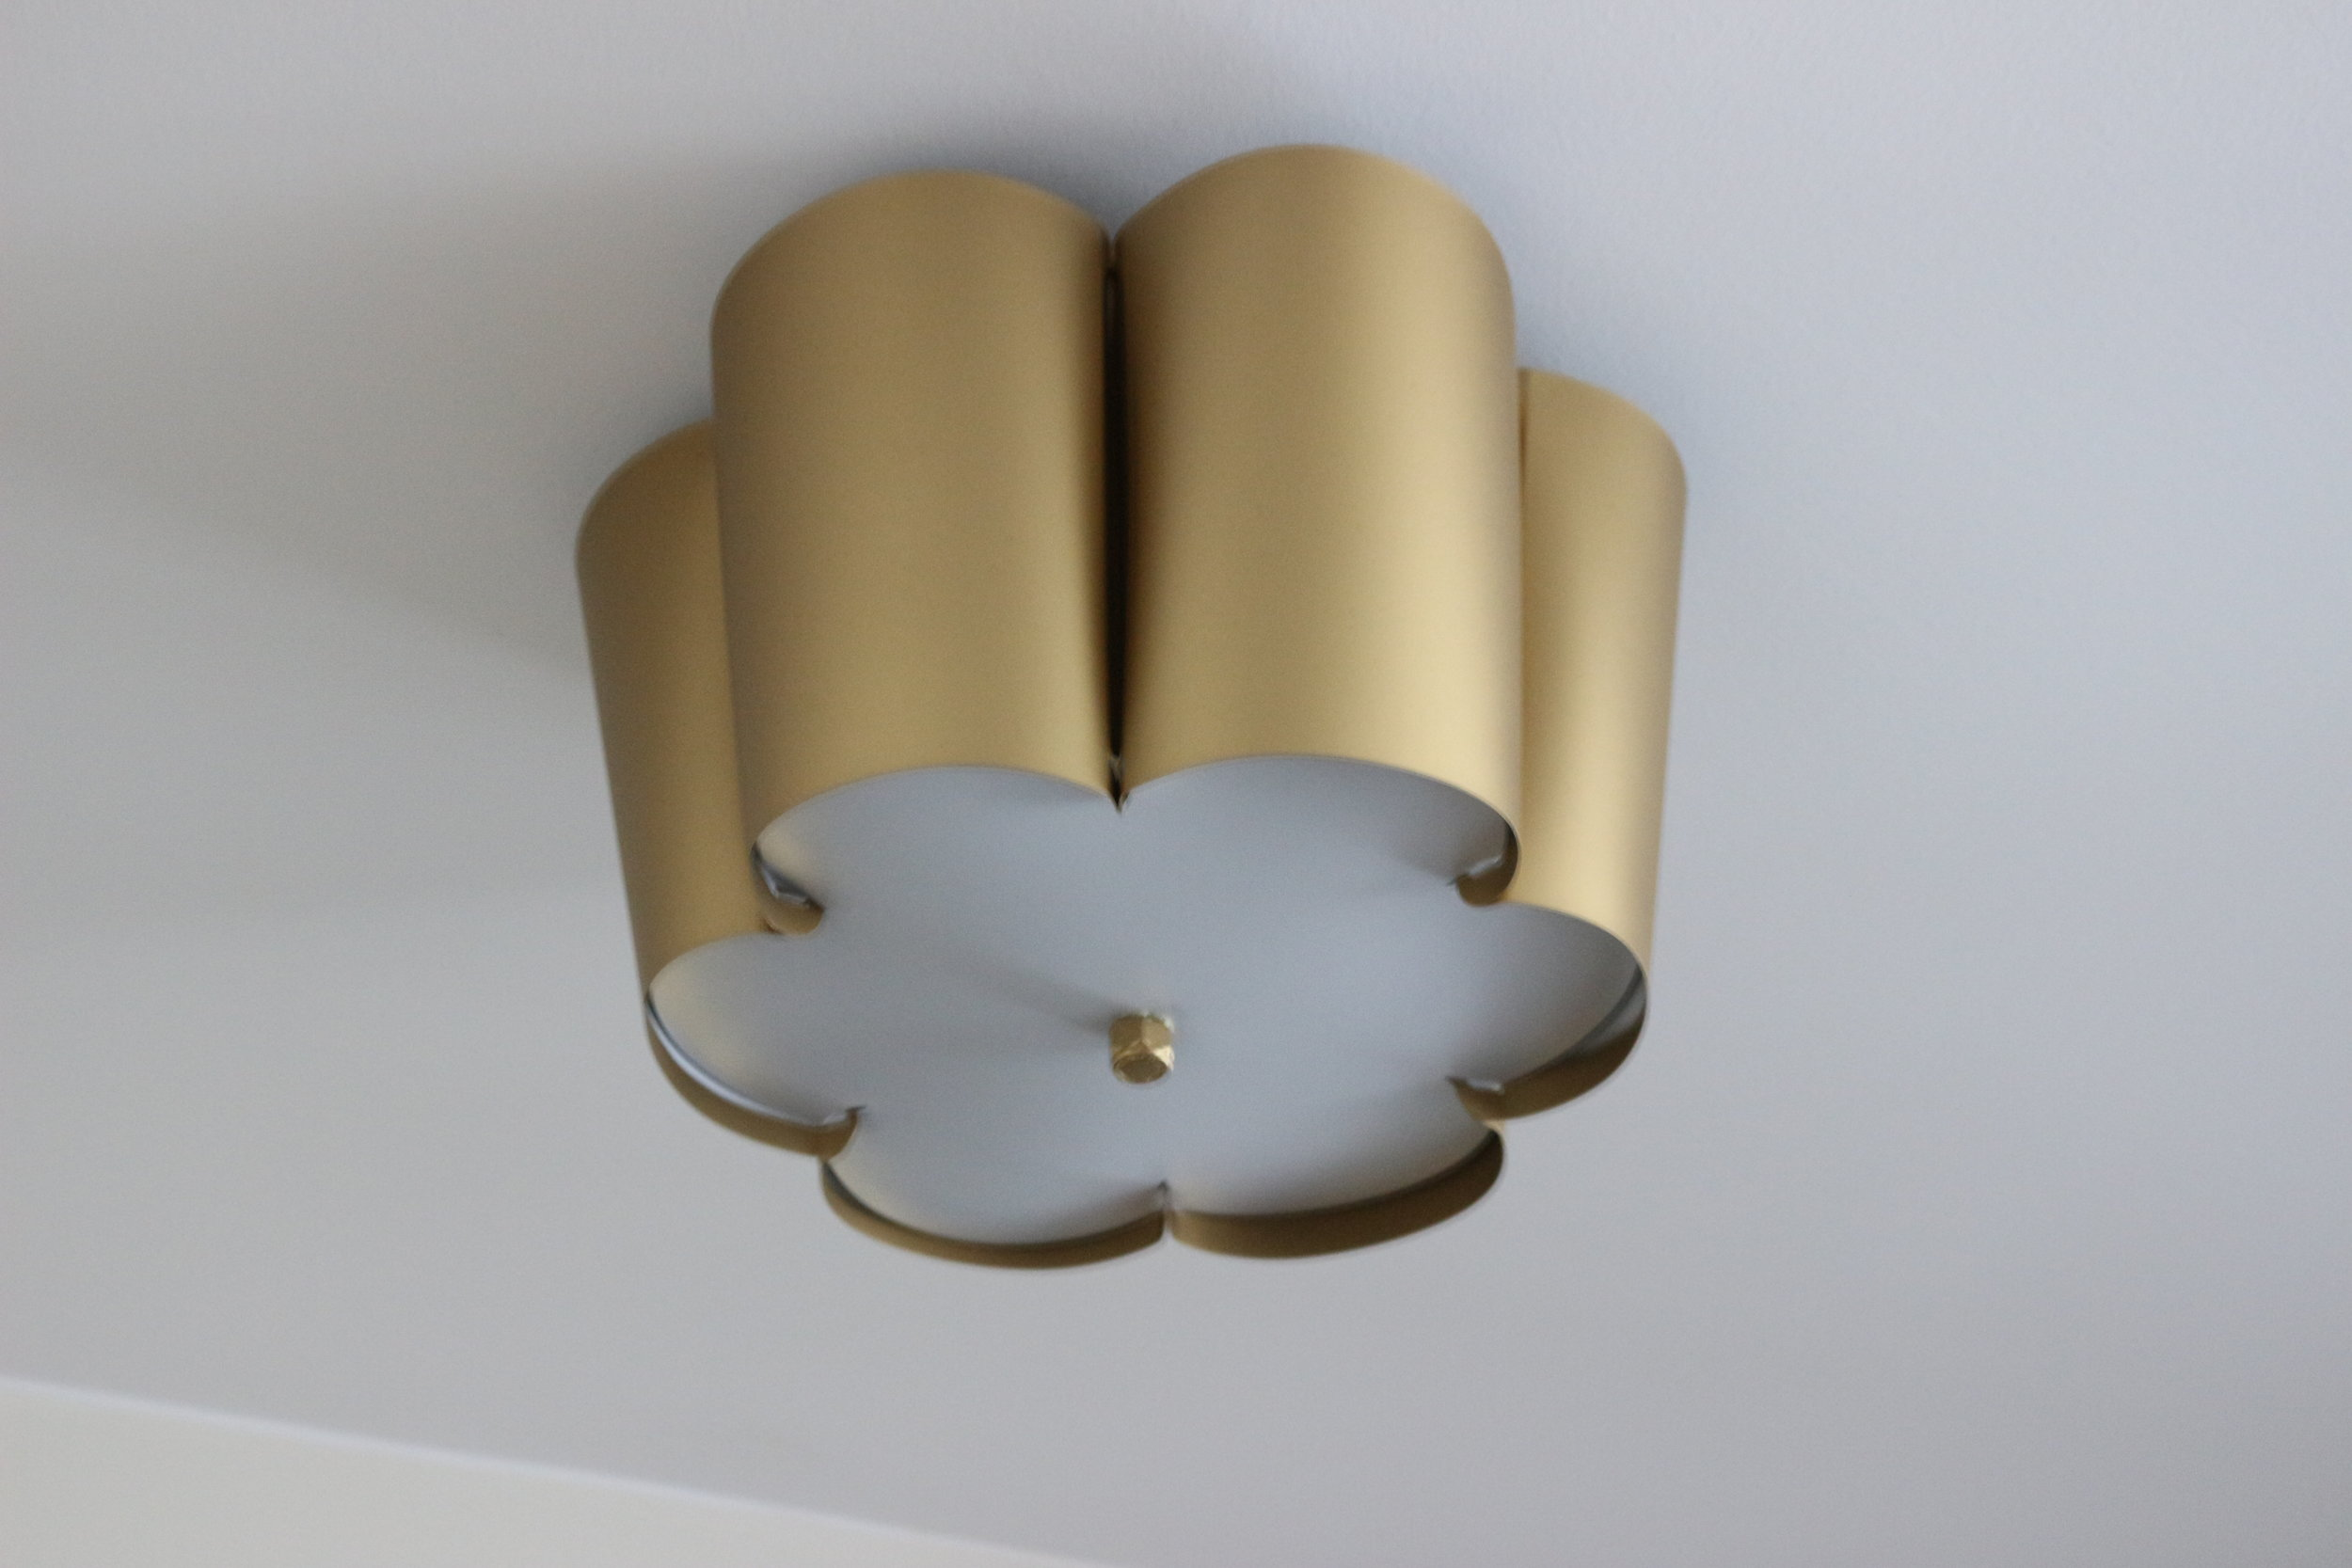 IKEA-hack-DIY-gold-flush-mount-full.jpg